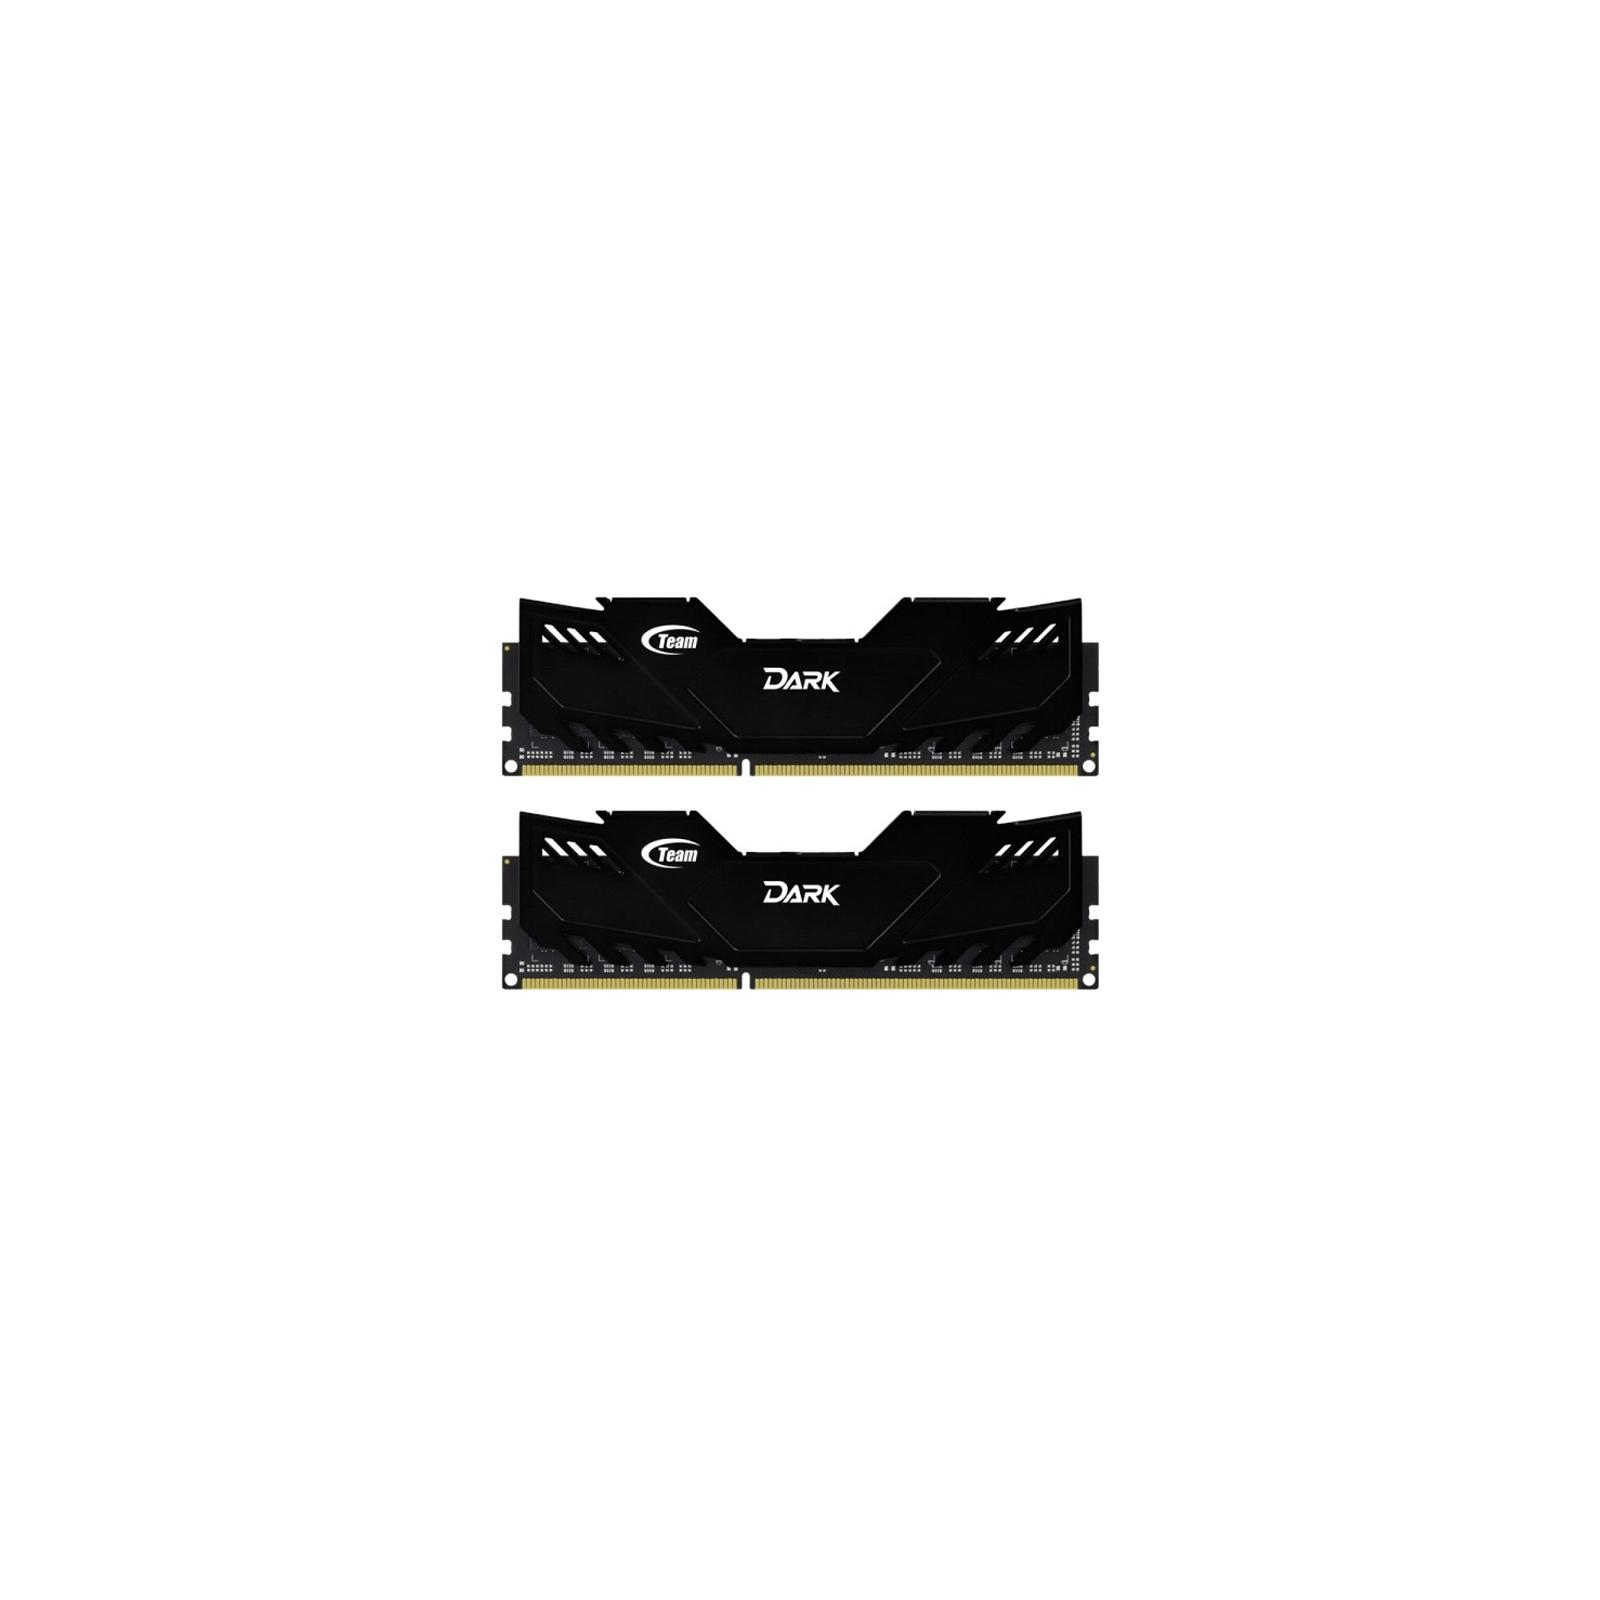 Модуль памяти для компьютера DDR4 16GB (2x8GB) 2666 MHz Dark Black Team (TDKED416G2666HC15ADC01)